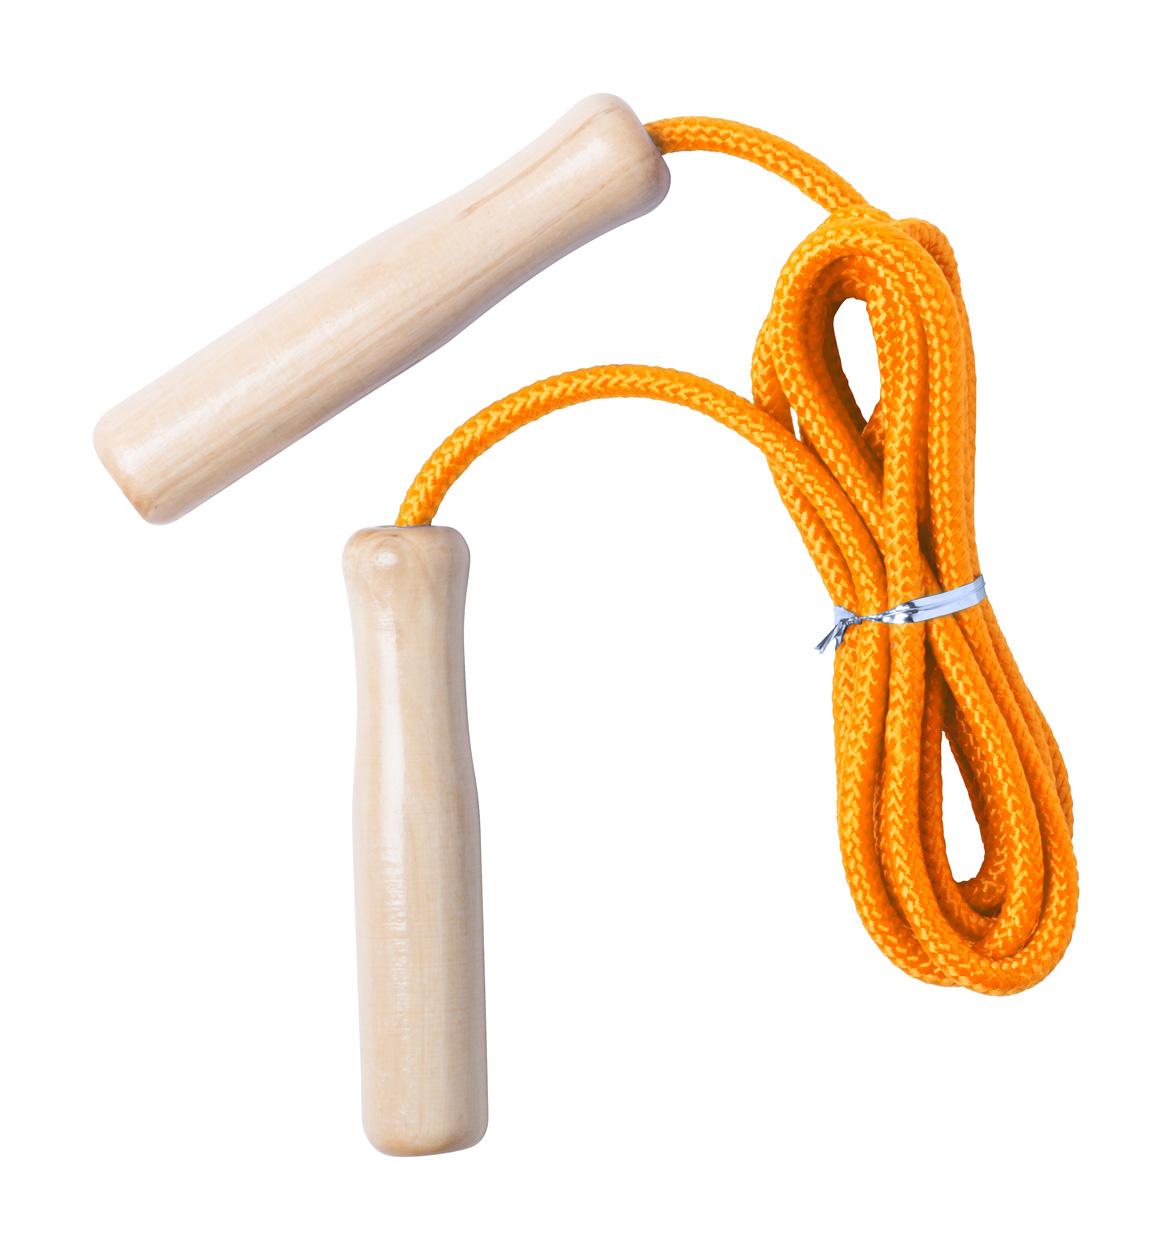 Galtax skipping rope